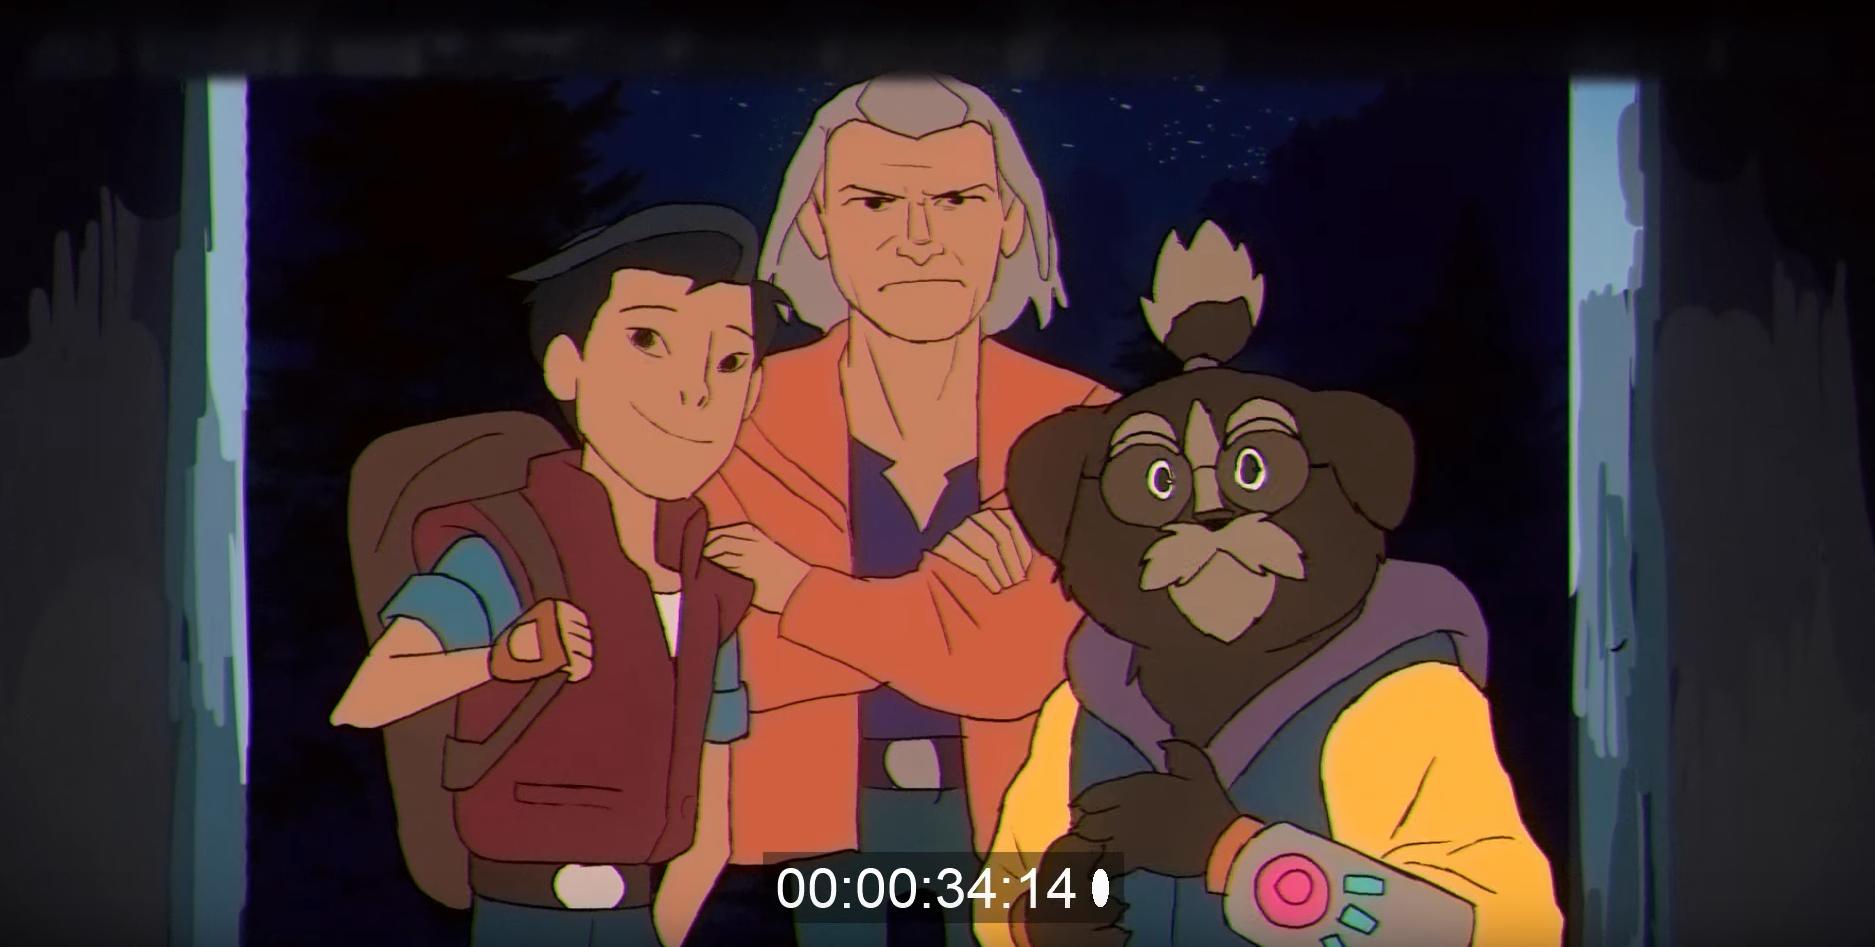 Короткометражка: Dream Bandits — трейлер фэнтези мультсериала в духе 90-х 6